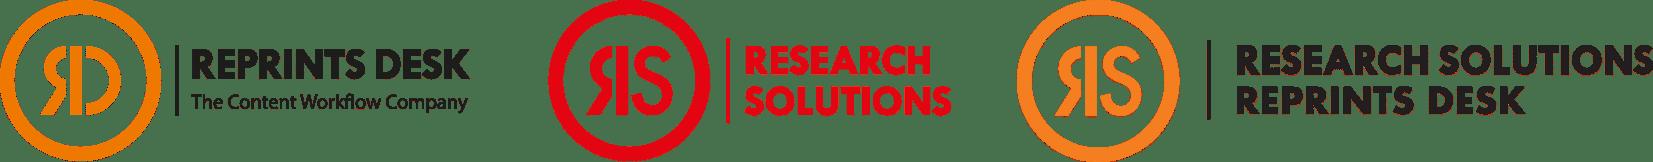 Reprints Desk | Research Solutions